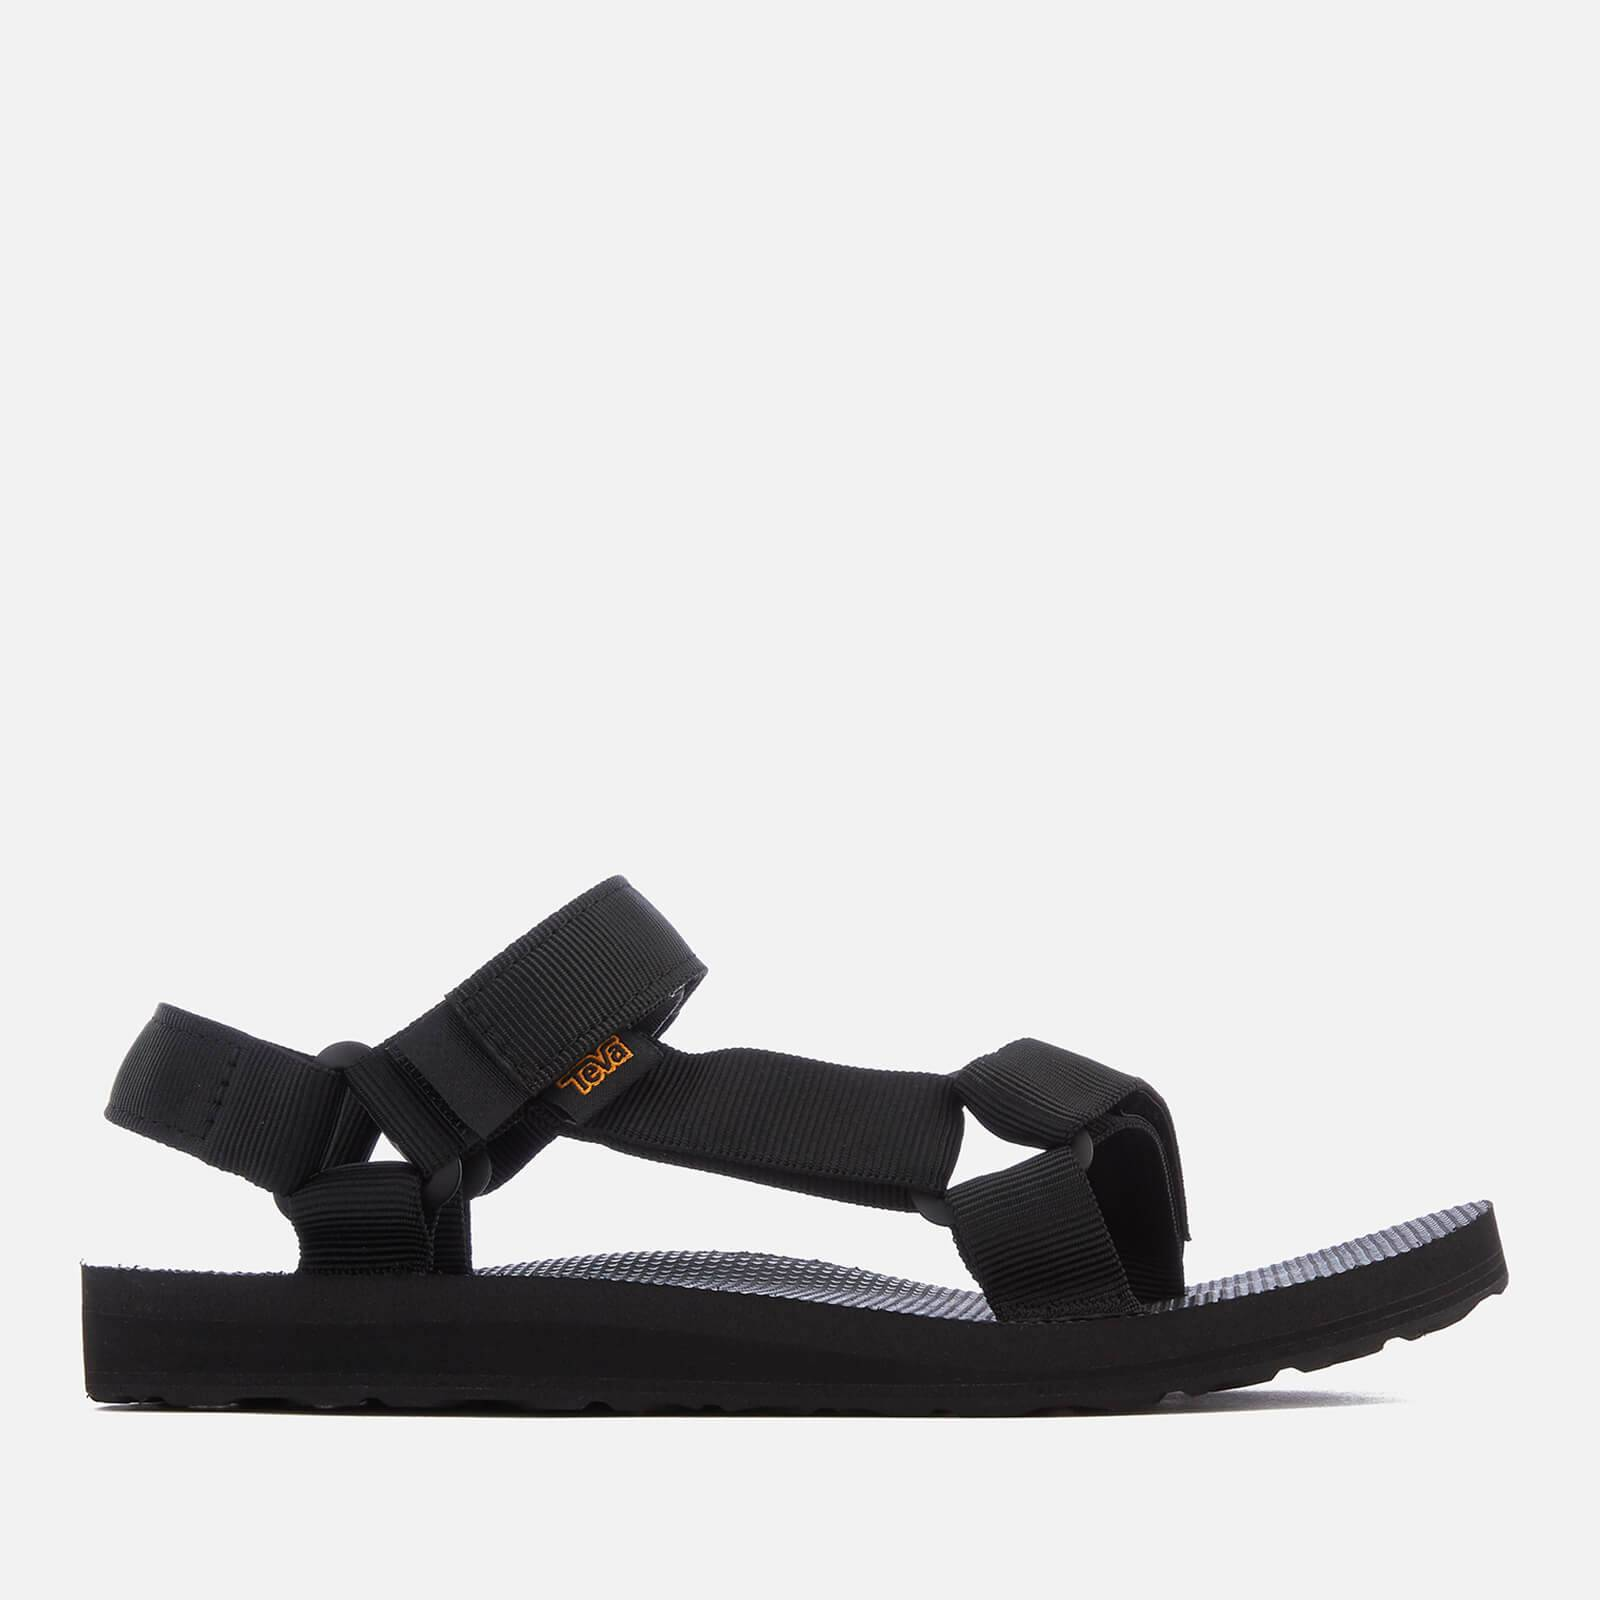 Teva Women's Original Universal Sport Sandals - Black - UK 8